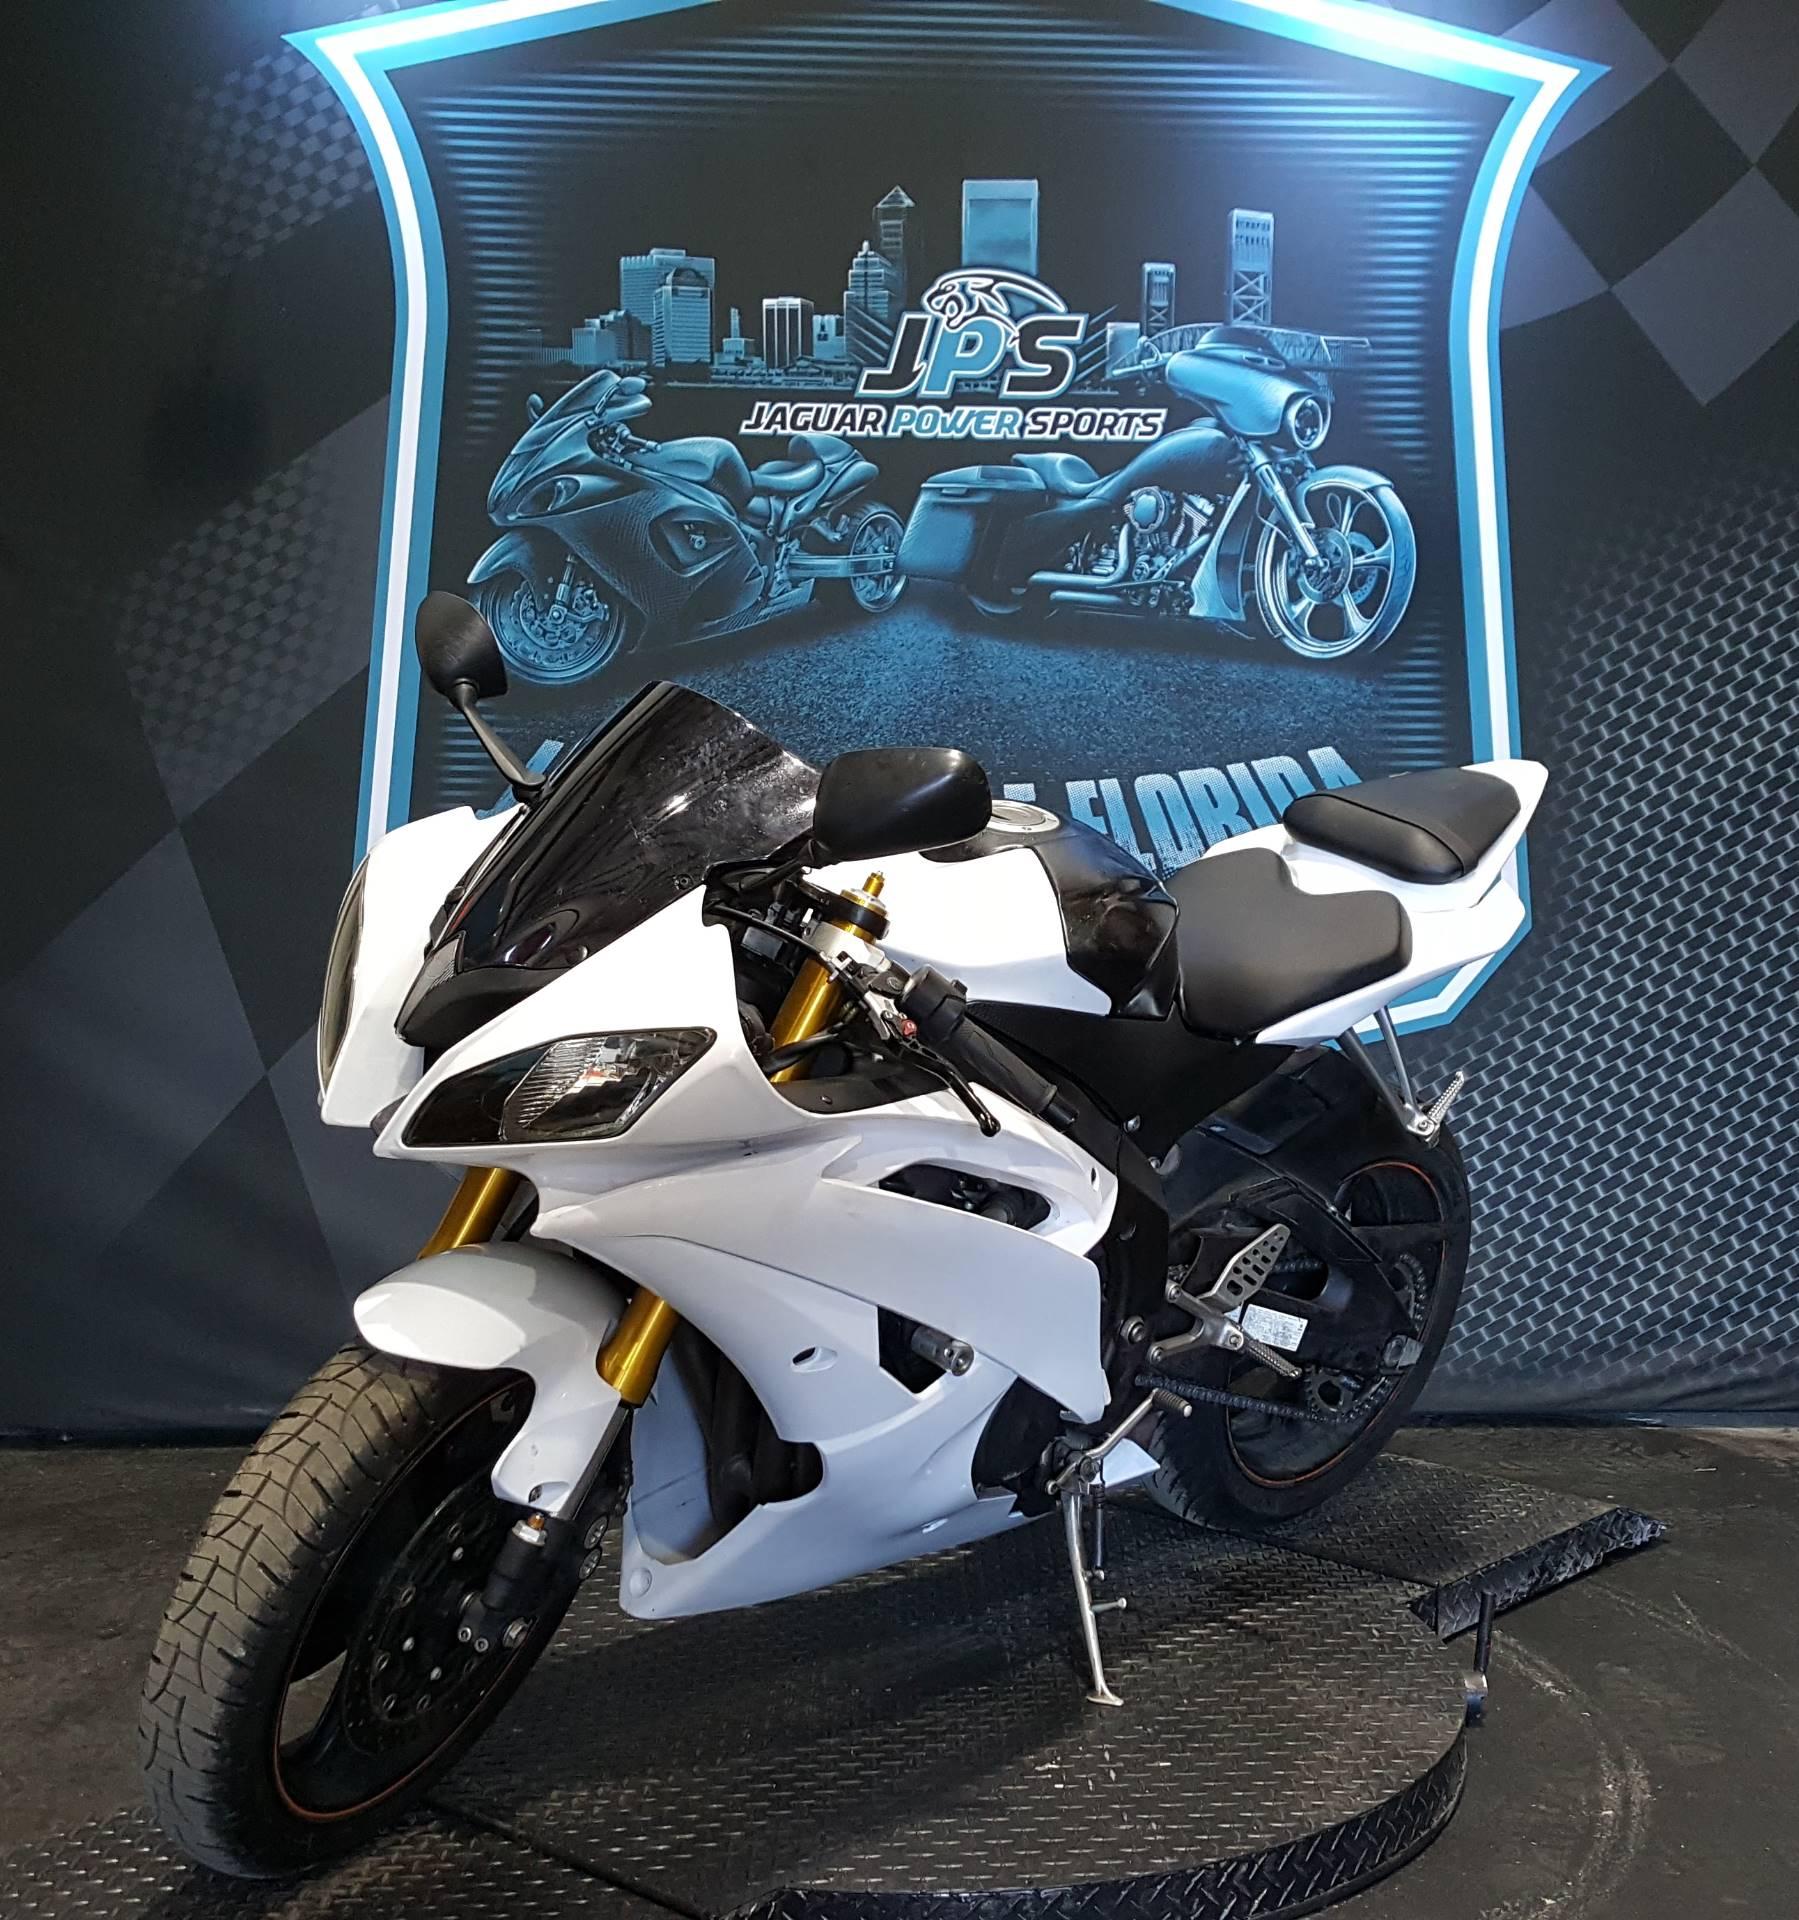 Jaguar power sports inventory dealer in jacksonville fl for Yamaha dealers in jacksonville fl